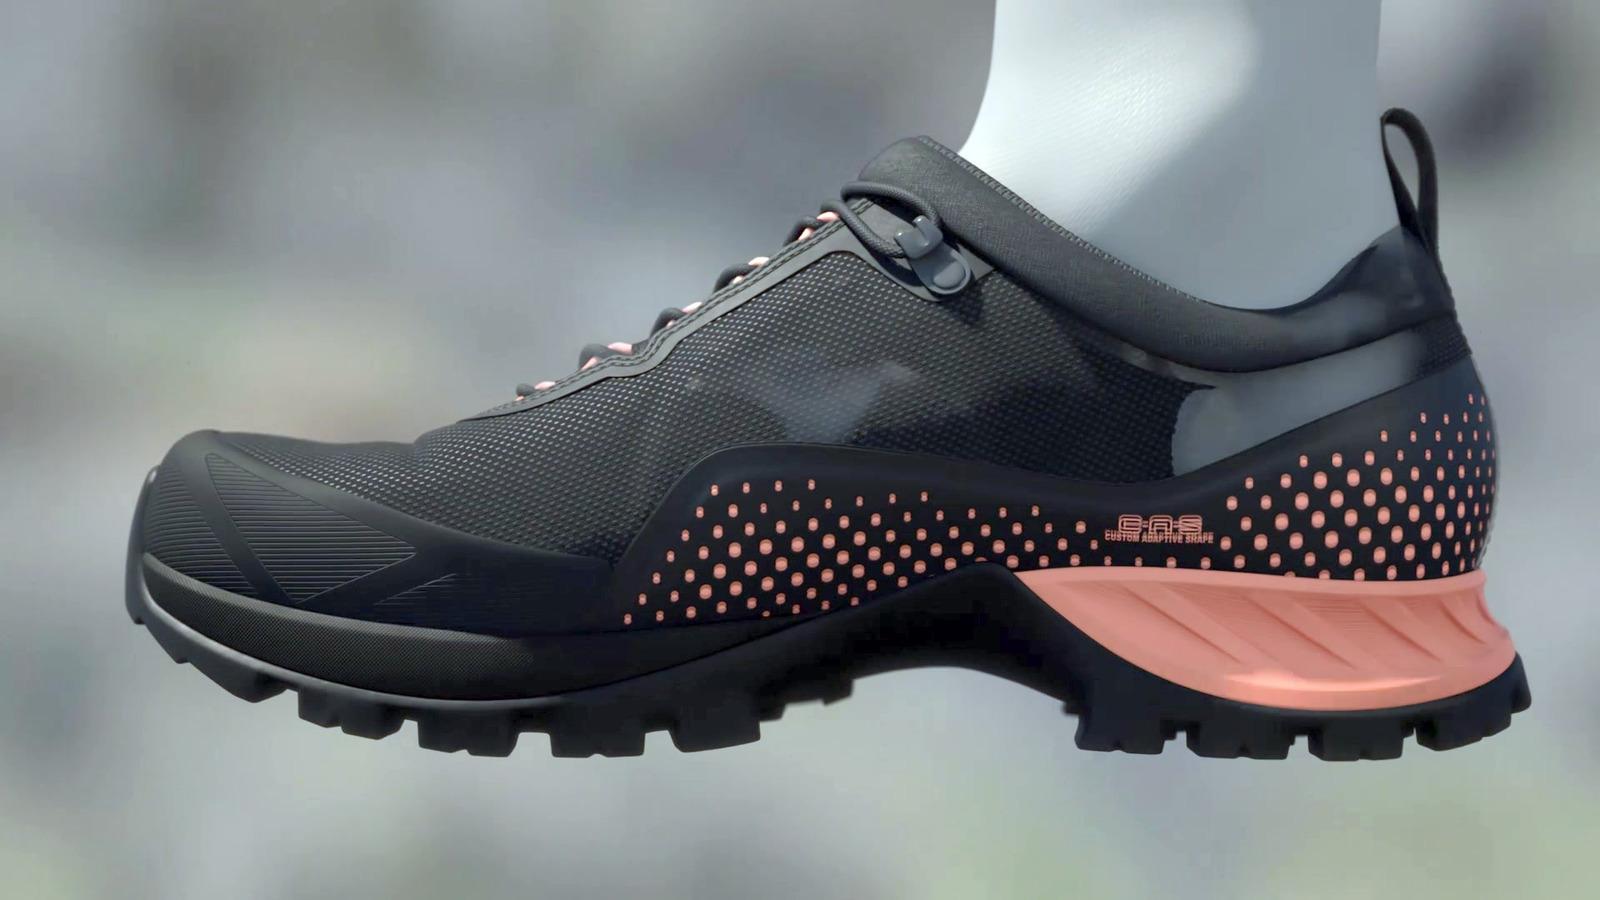 Chaussure Tecnica S OutdoorTest Privé Plasma nOPk80w